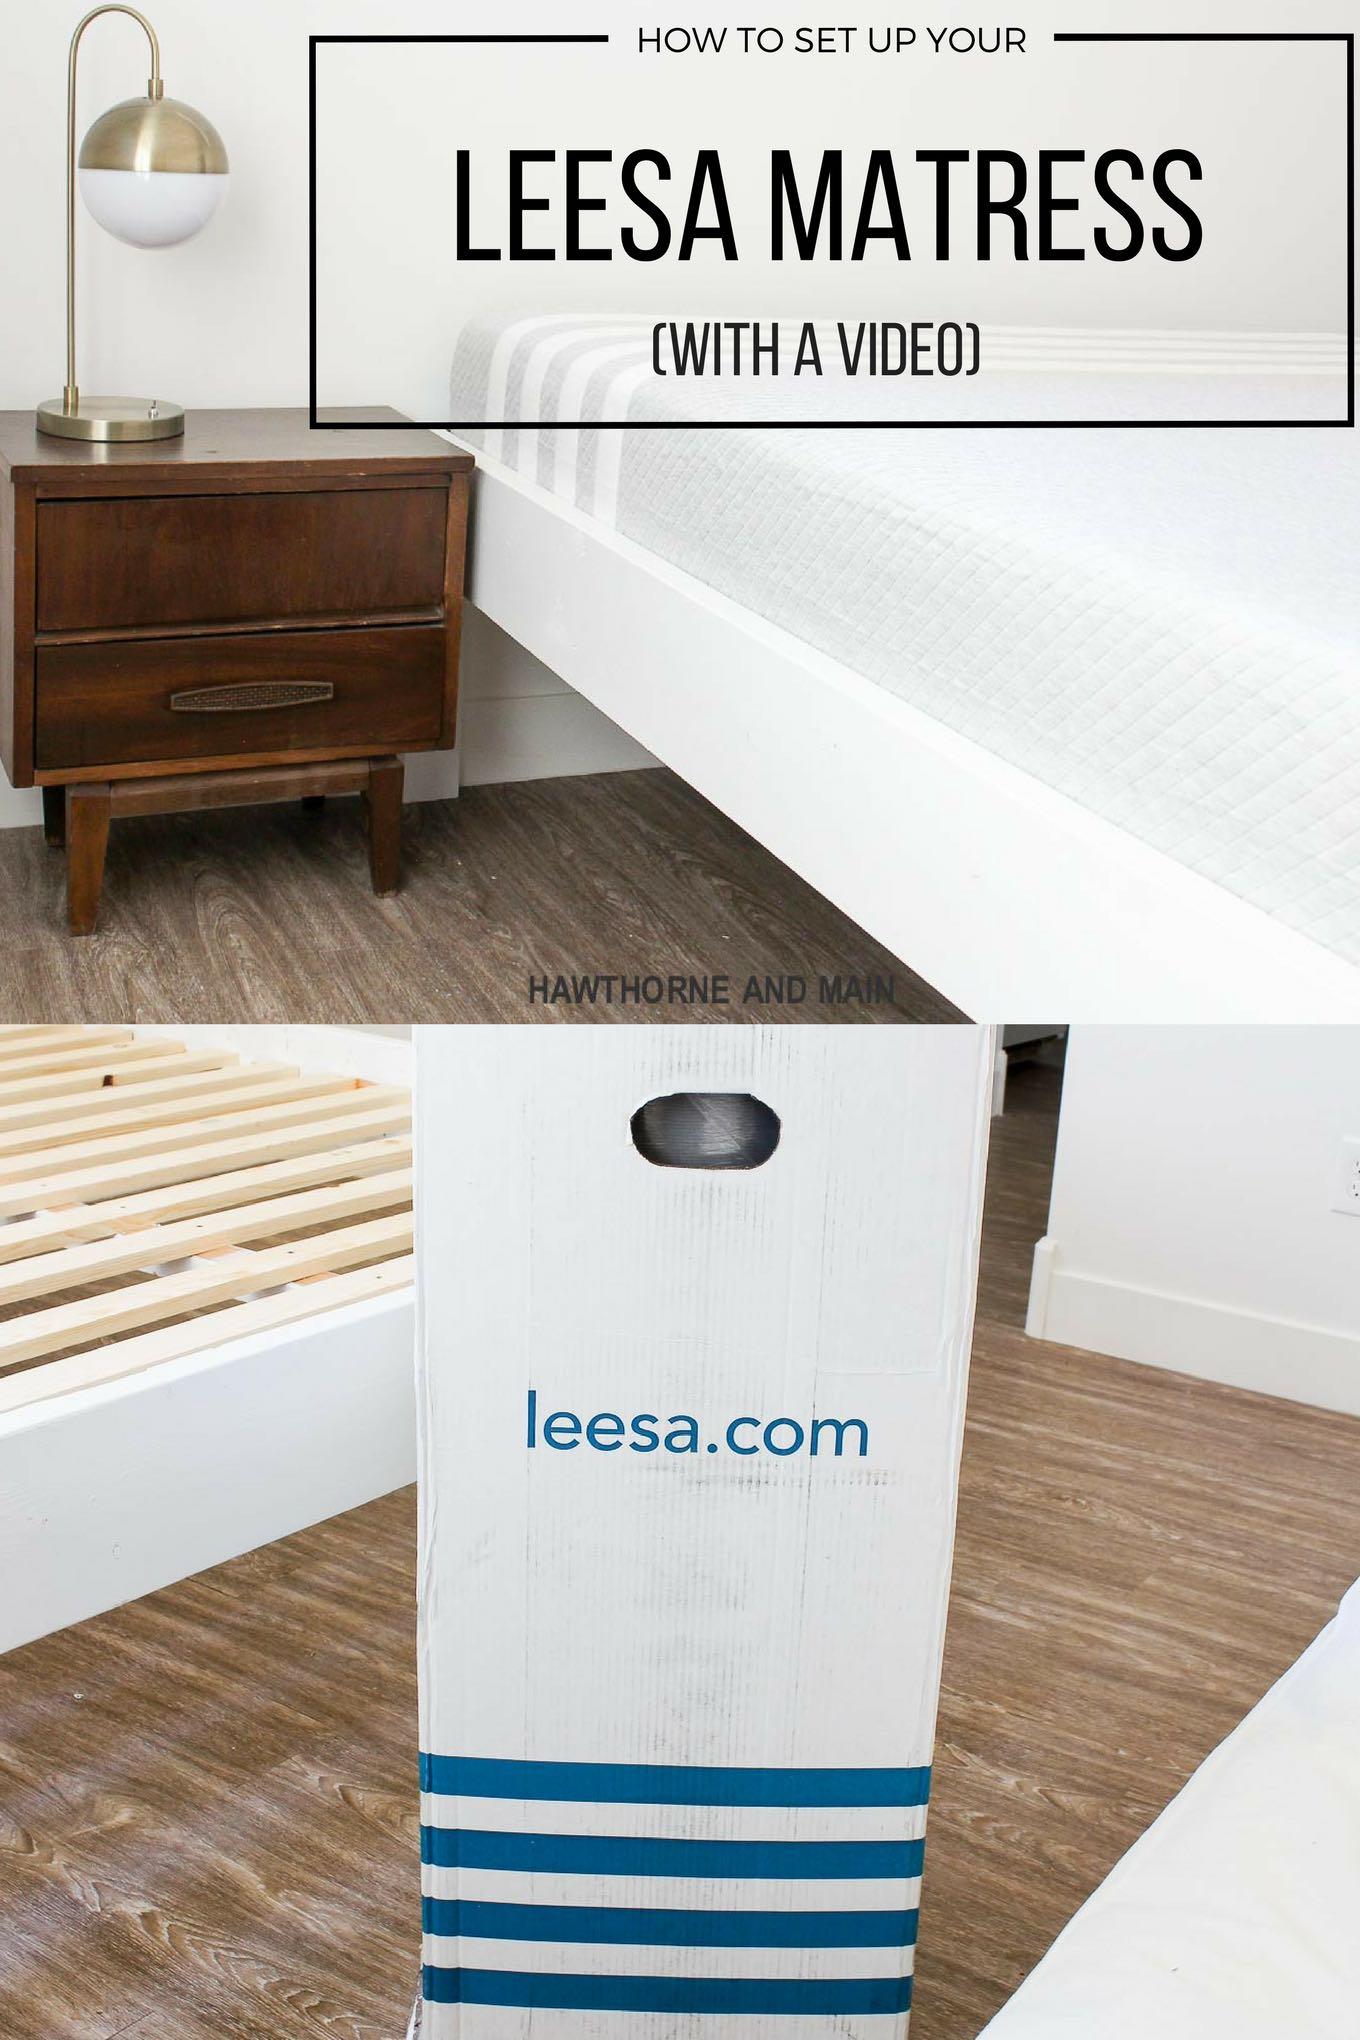 How To Set Up A Leesa Mattress Hawthorne And Main